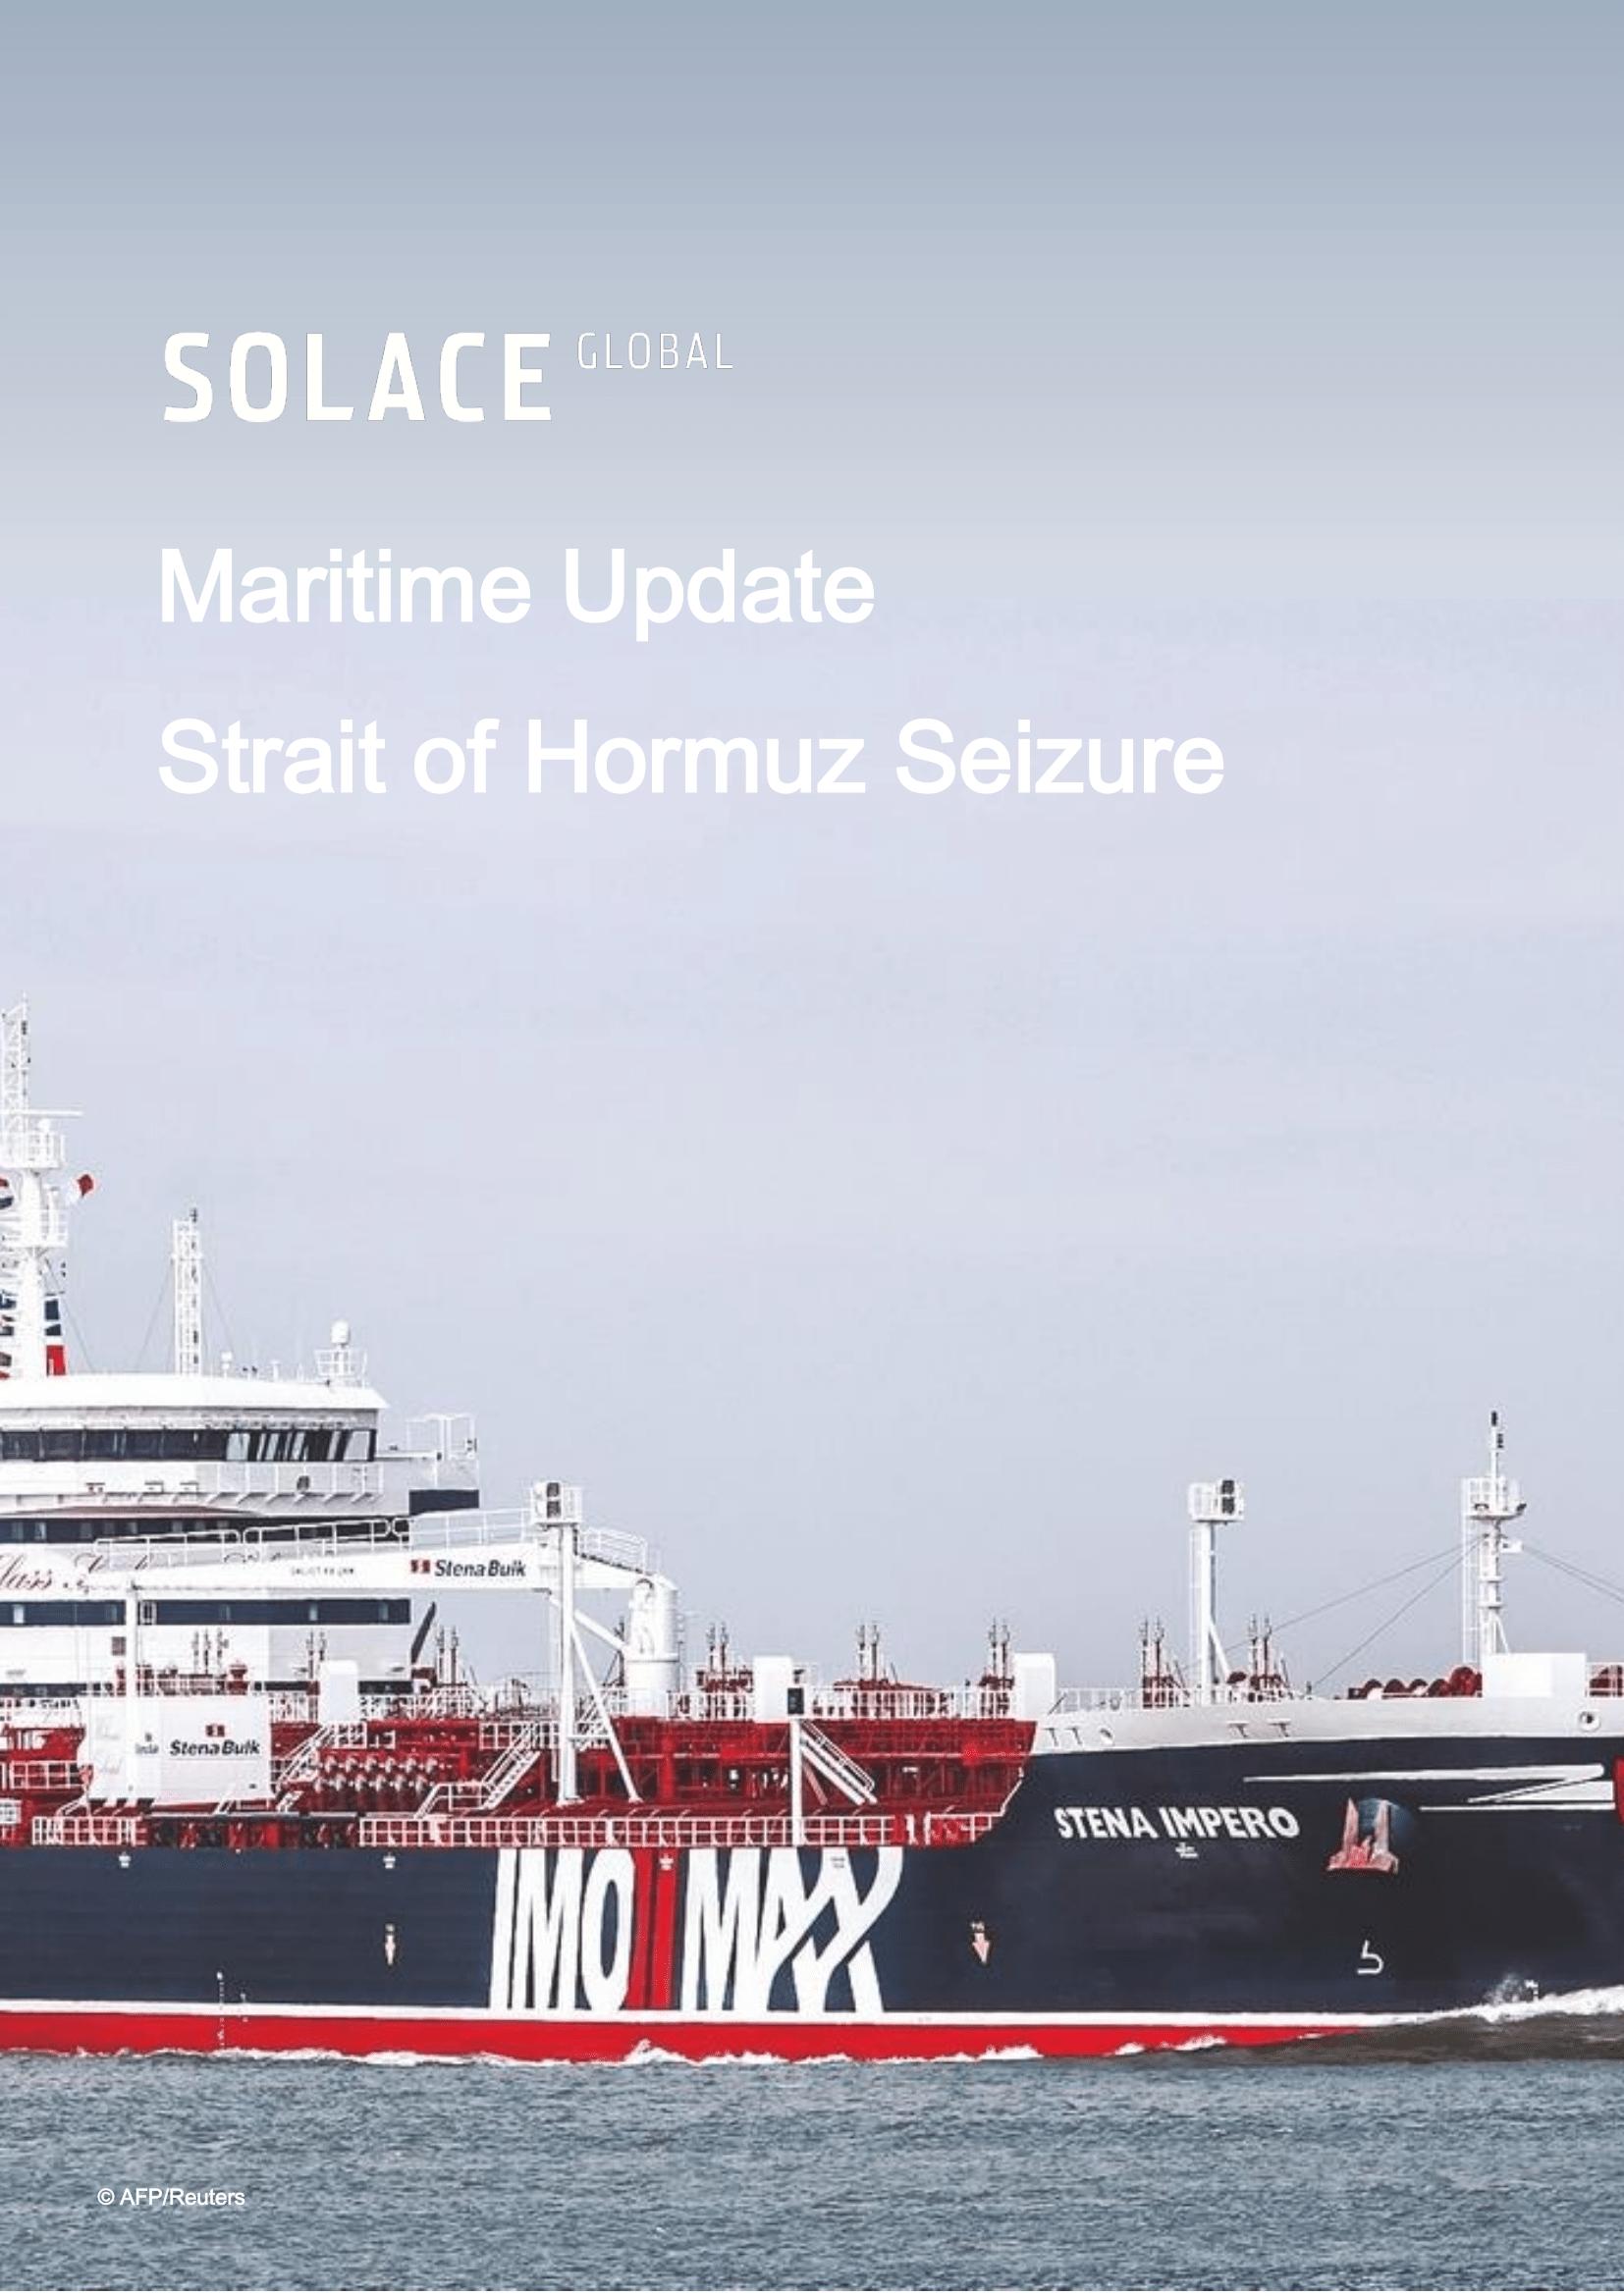 Maritime Update – Strait of Hormuz Seizure